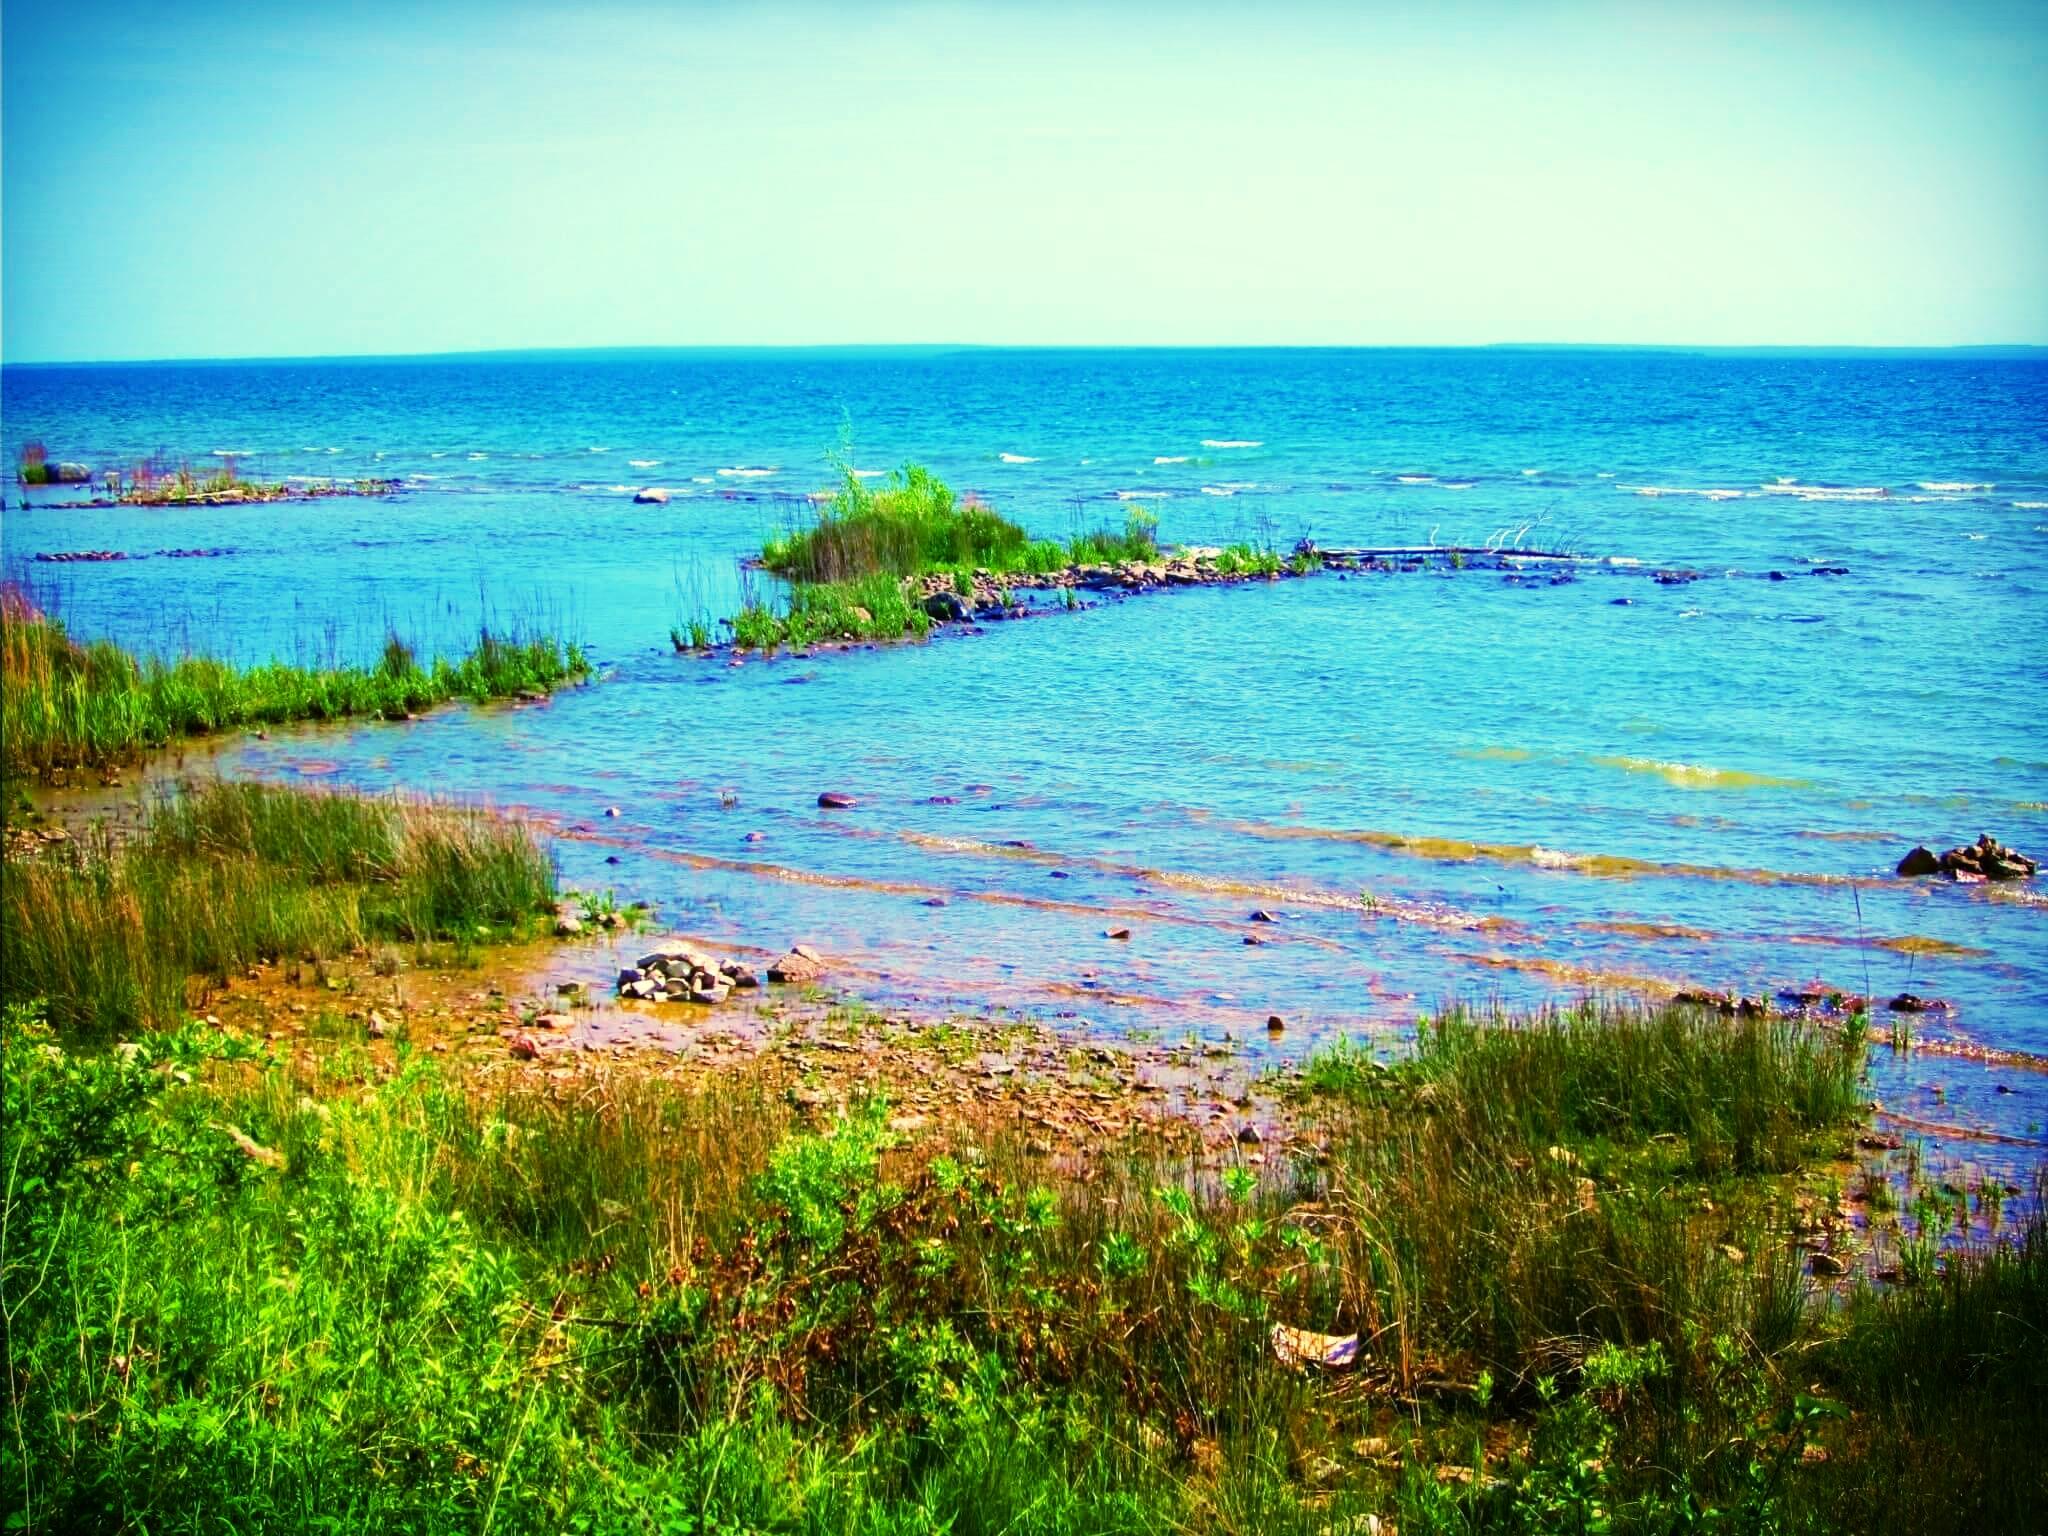 Lake Huron, St. Ignace, Michigan, June 2011